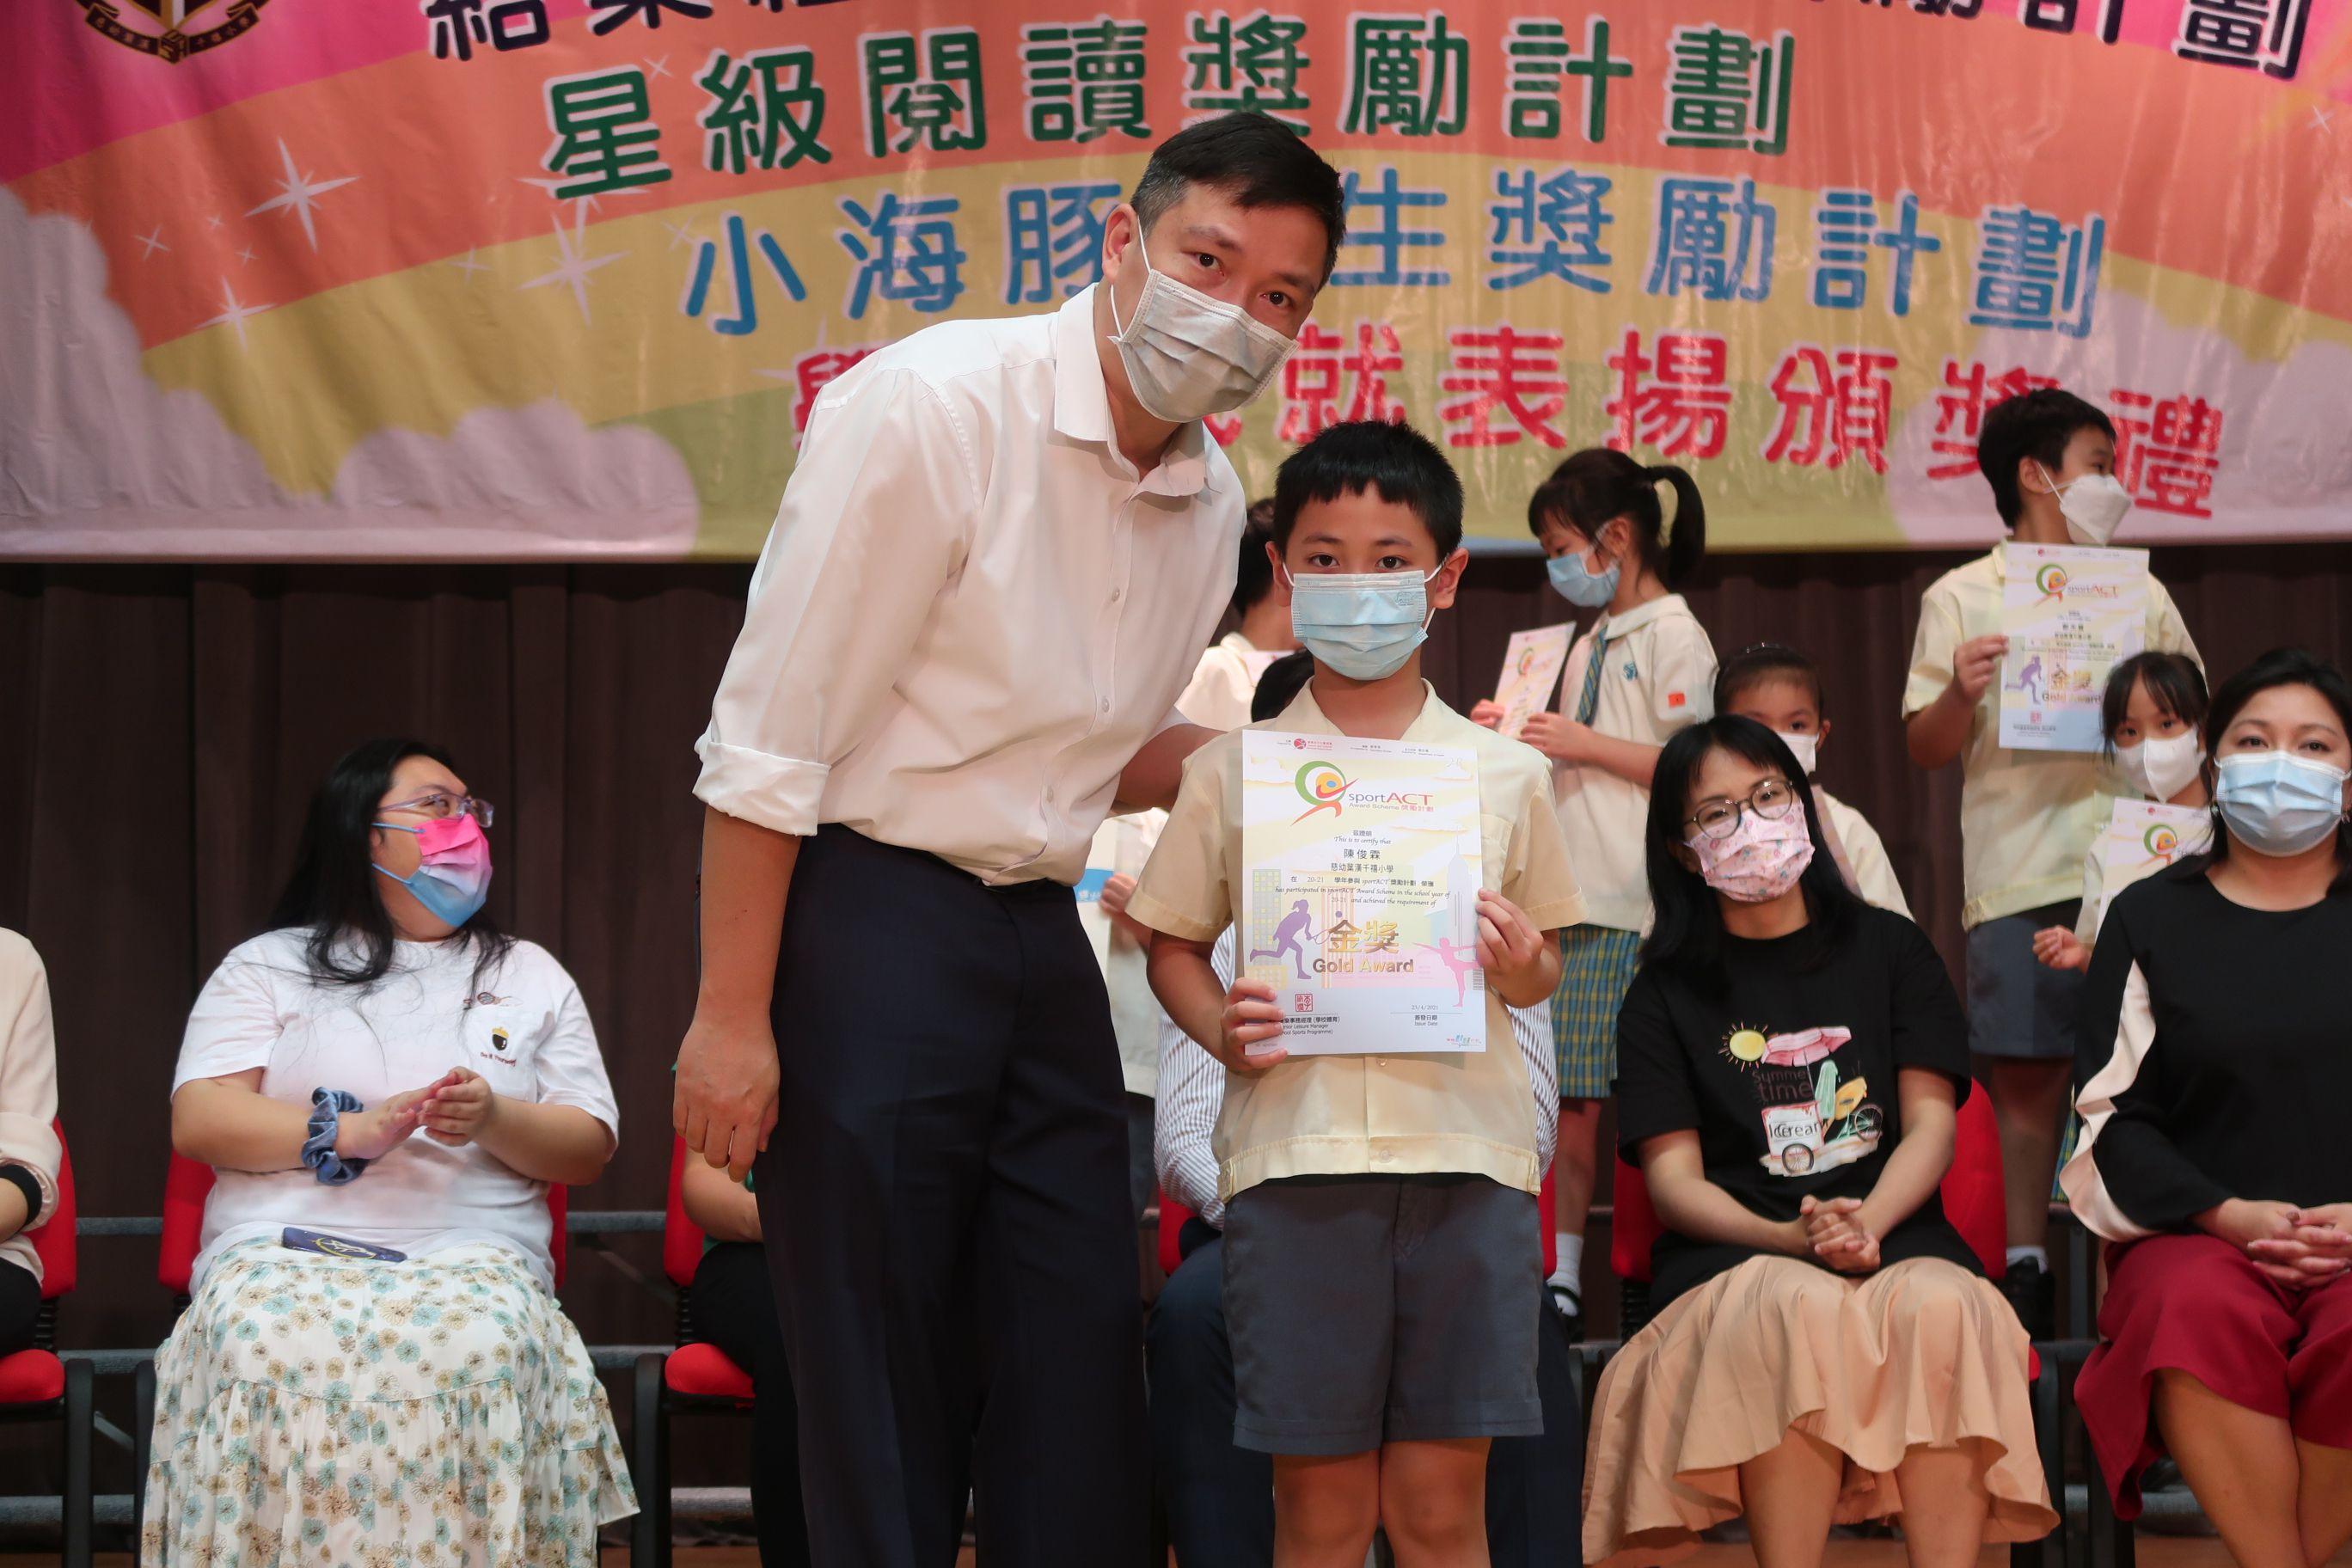 https://syh.edu.hk/sites/default/files/img_5904.jpg